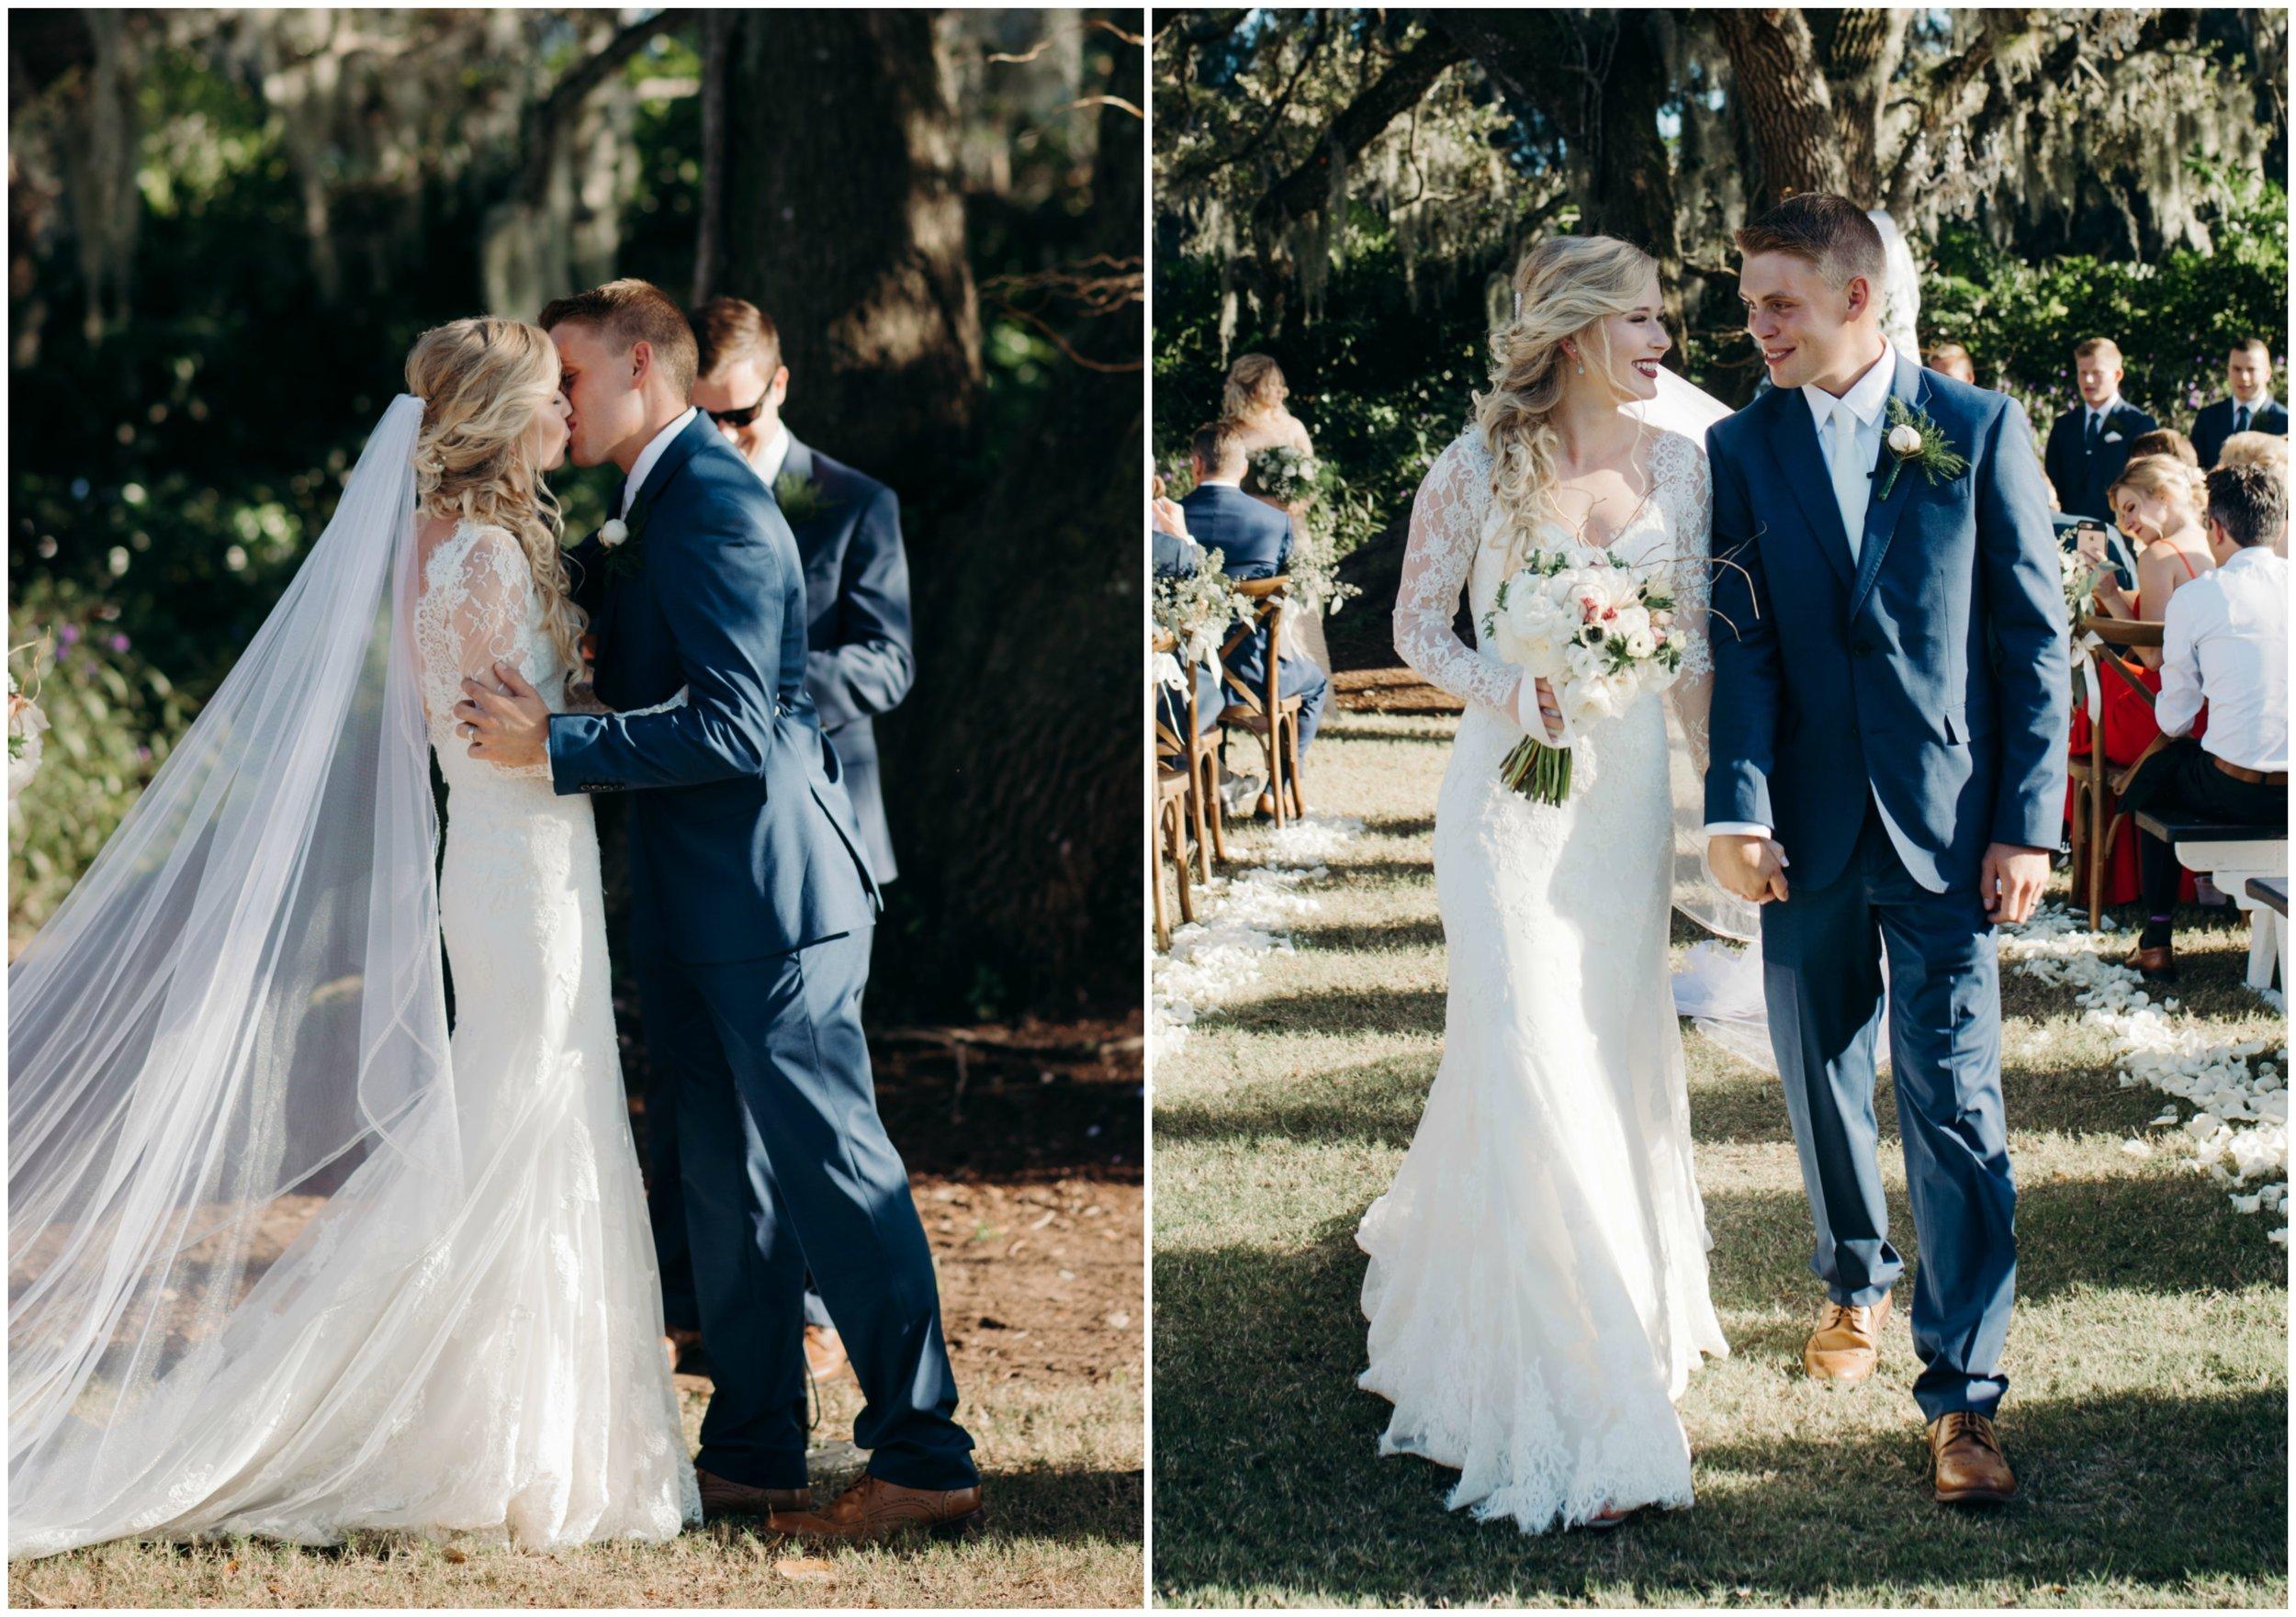 micayla-greyson-wedding-ceremony-exit.jpg